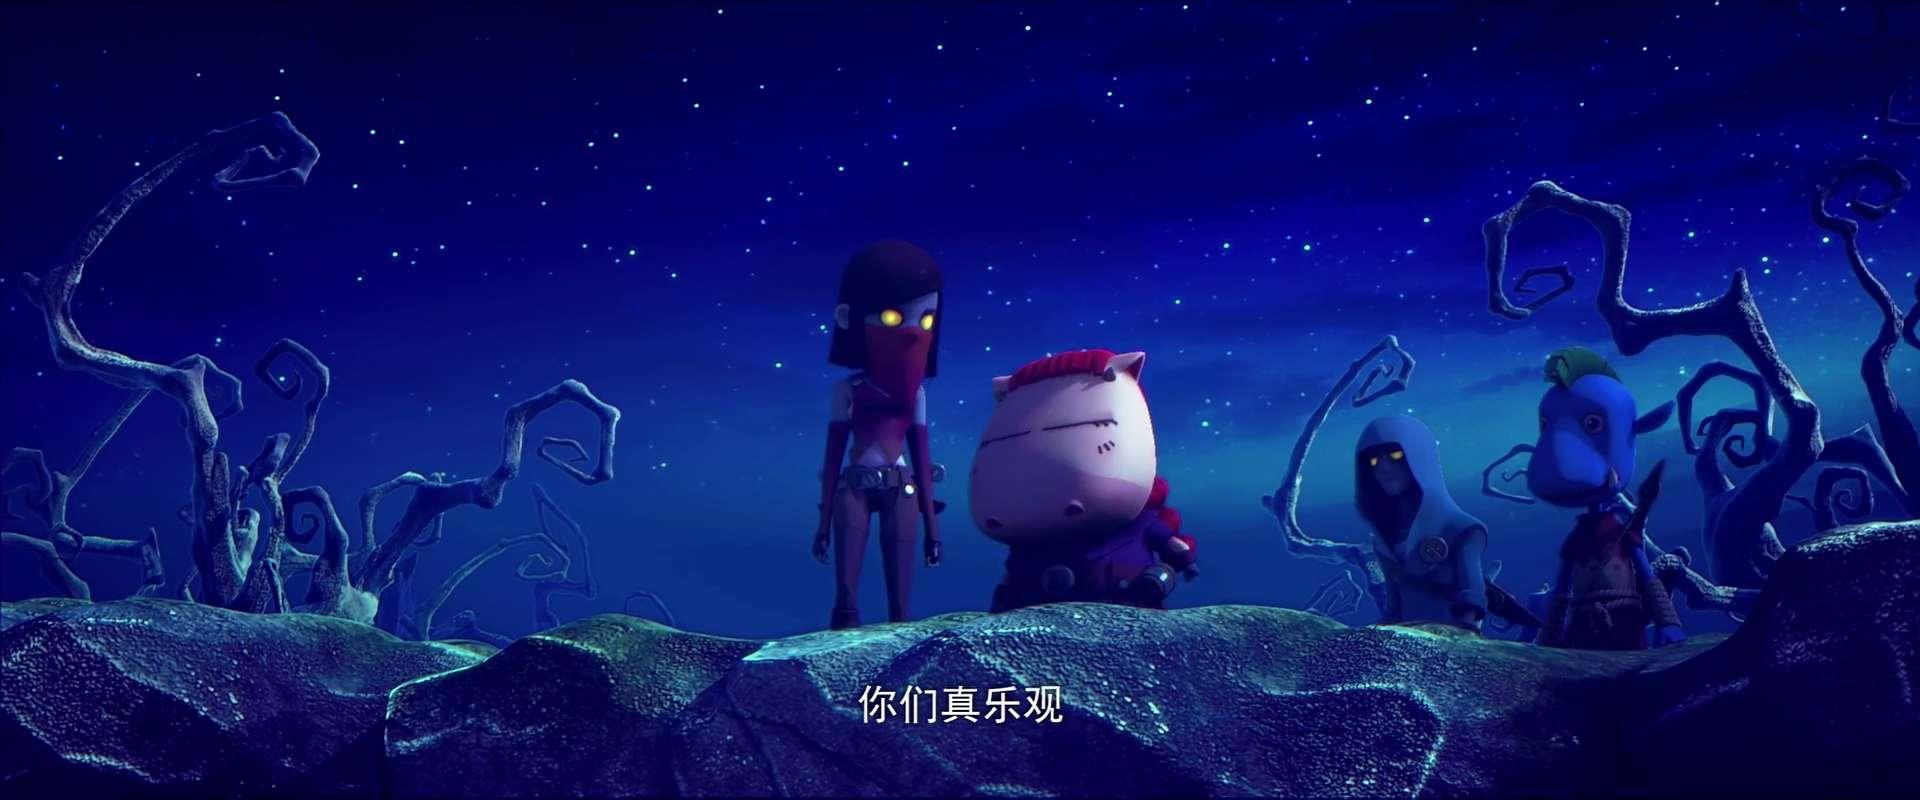 ЭмТи - мумугучий драконоборец | HDTV 1080p | AniDub